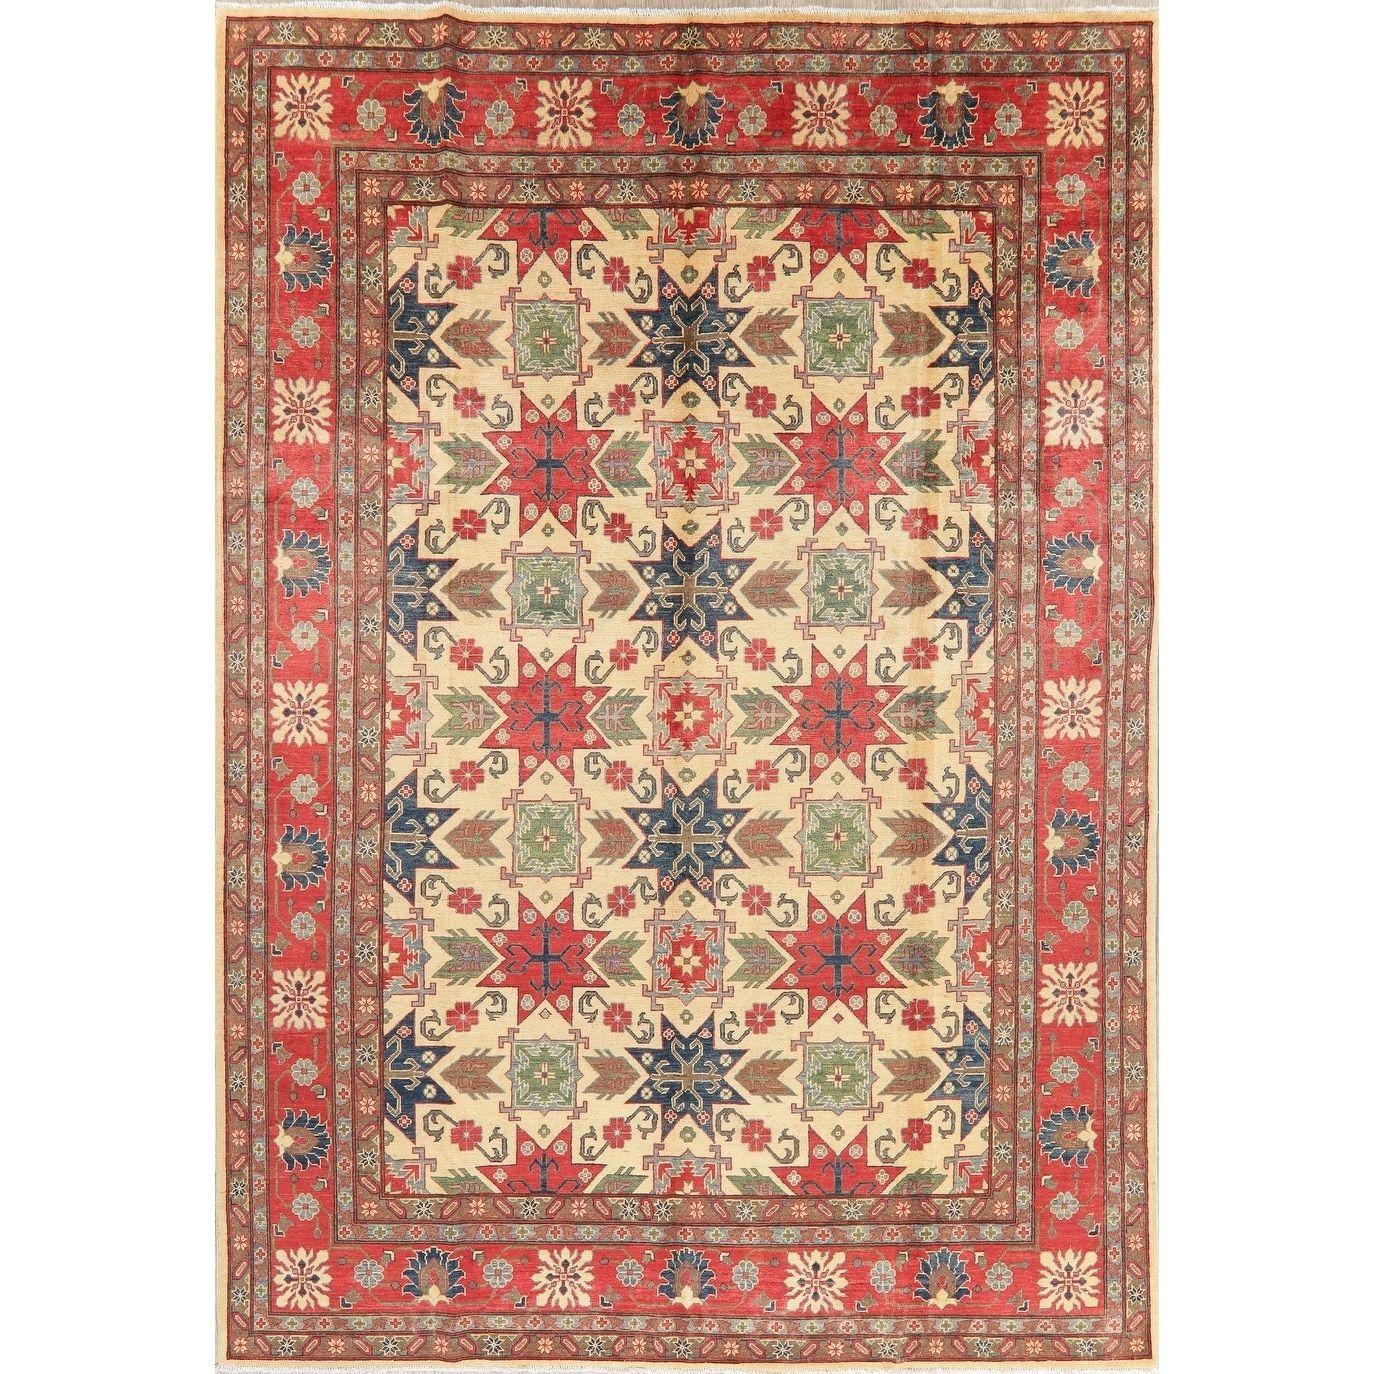 Kazak Oriental Hand Knotted Wool Pakistani Area Rug 12 4 X 8 7